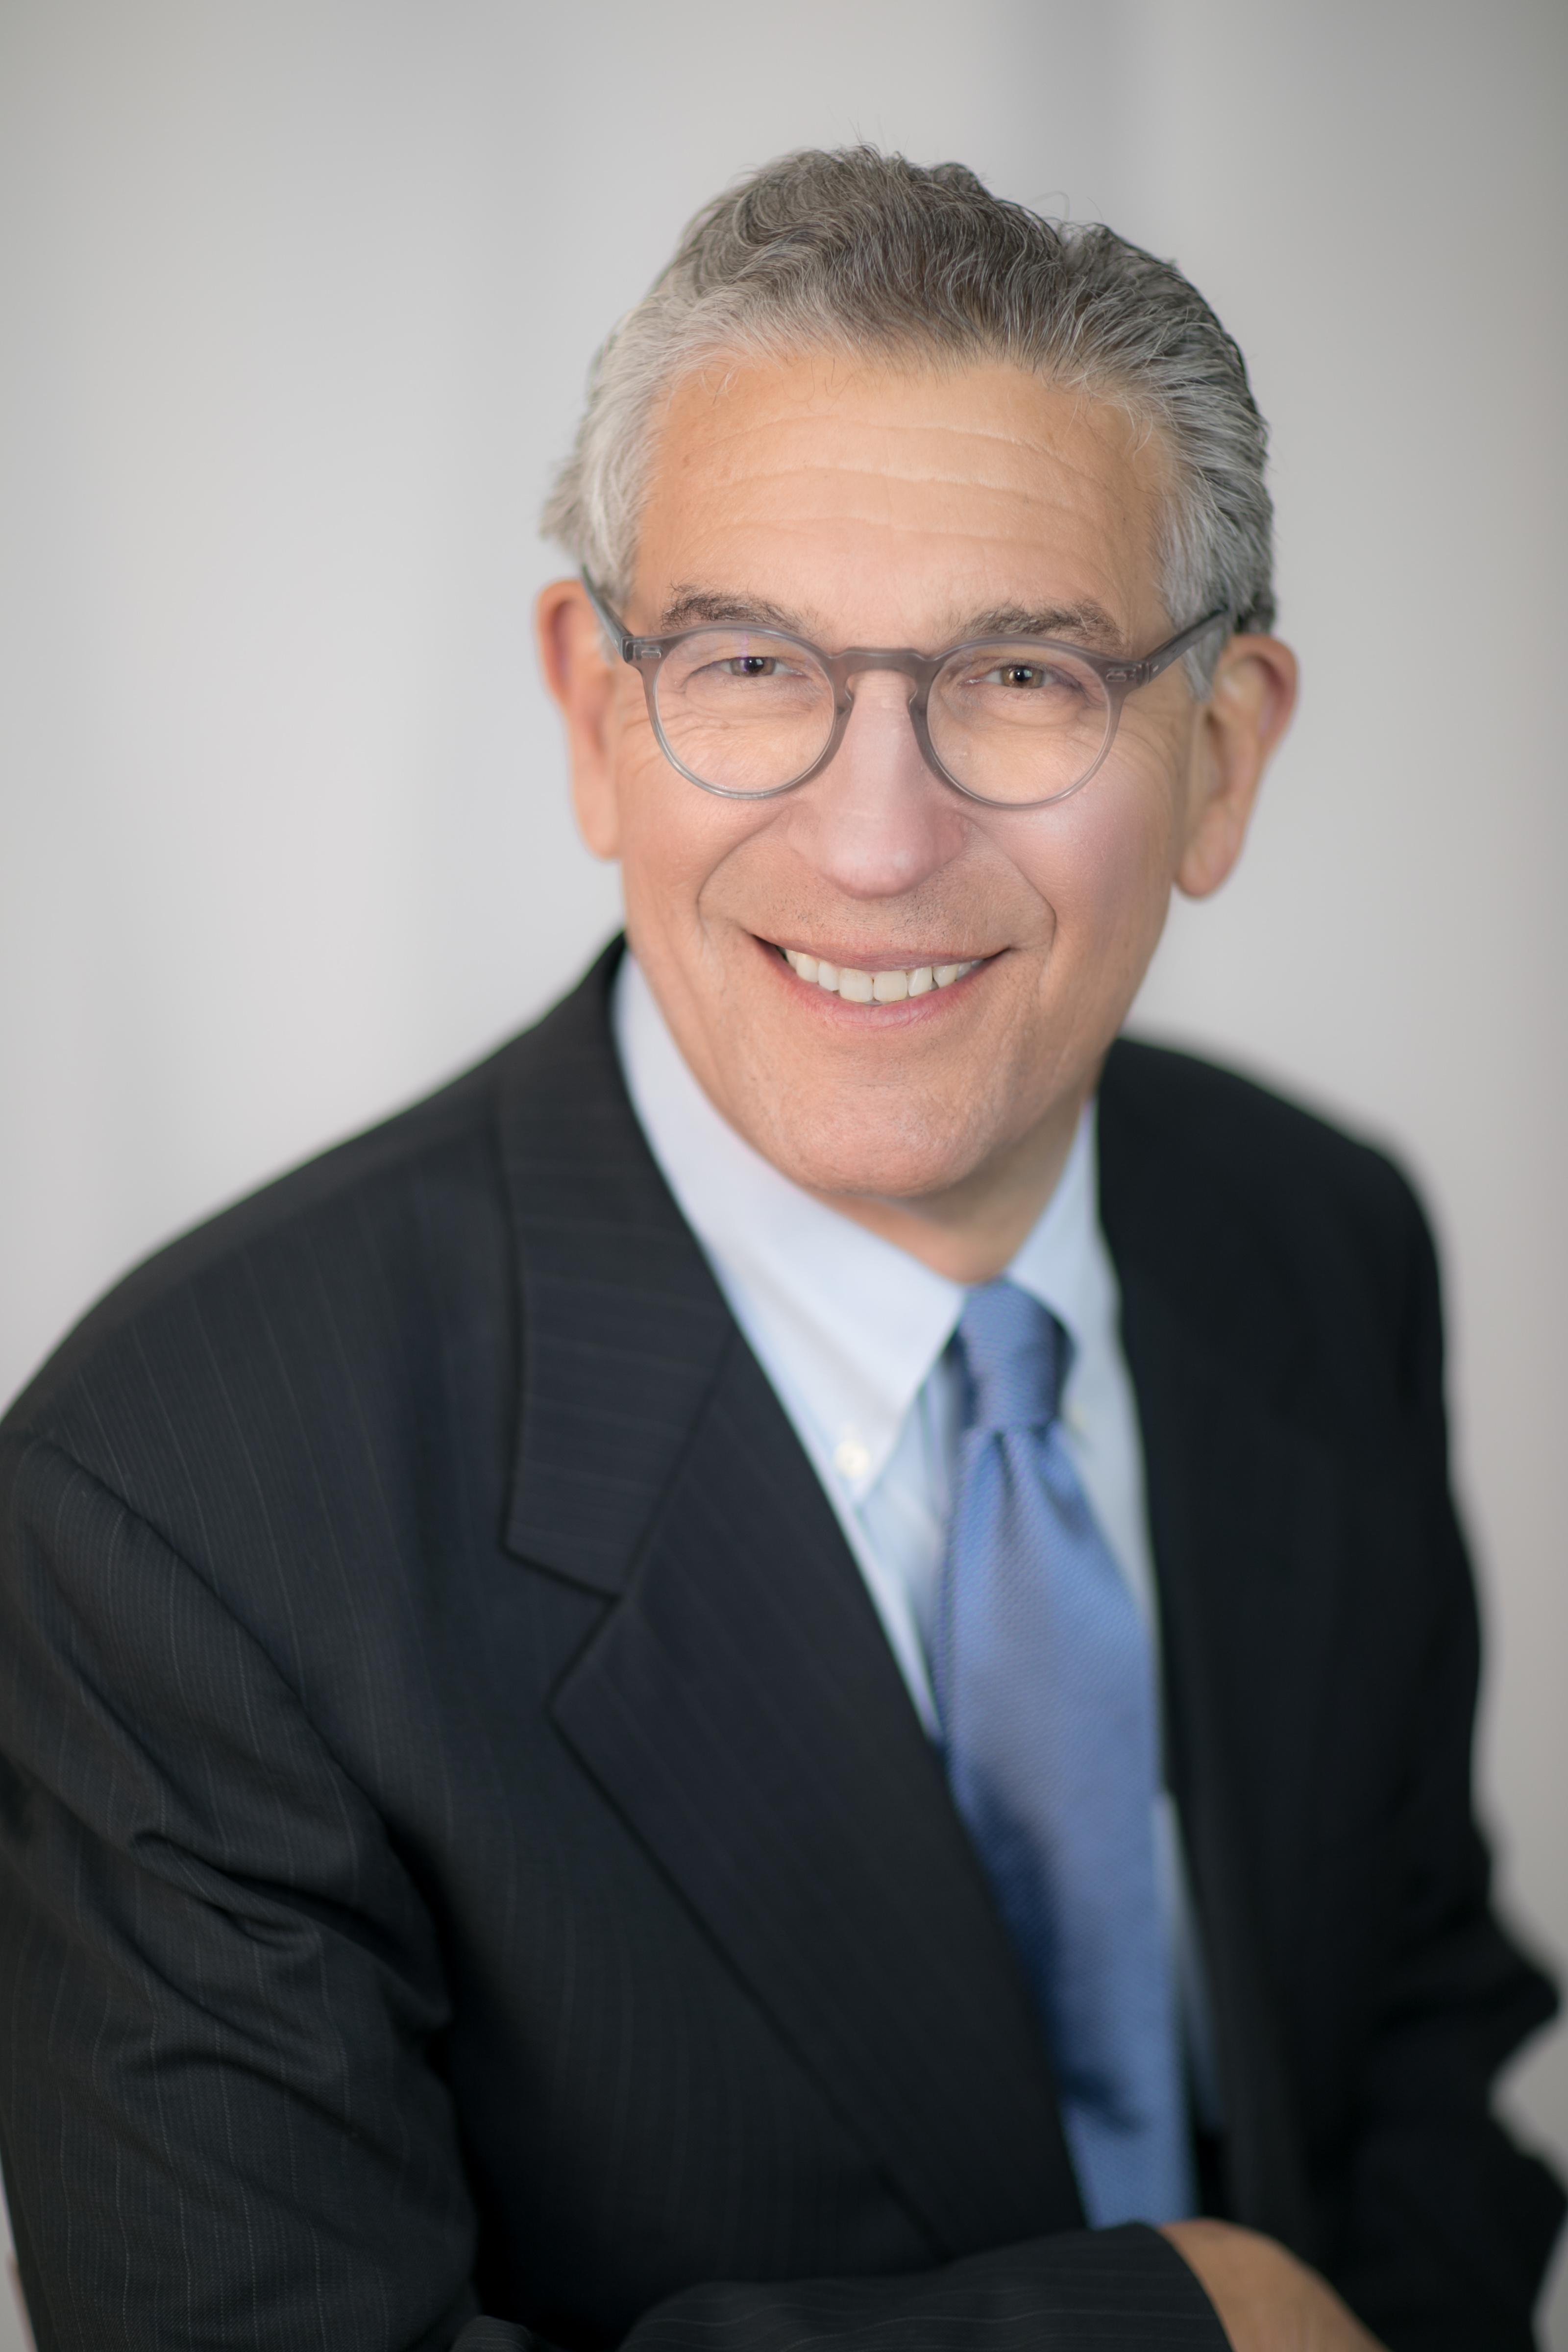 Dr. Michael B. Spellman